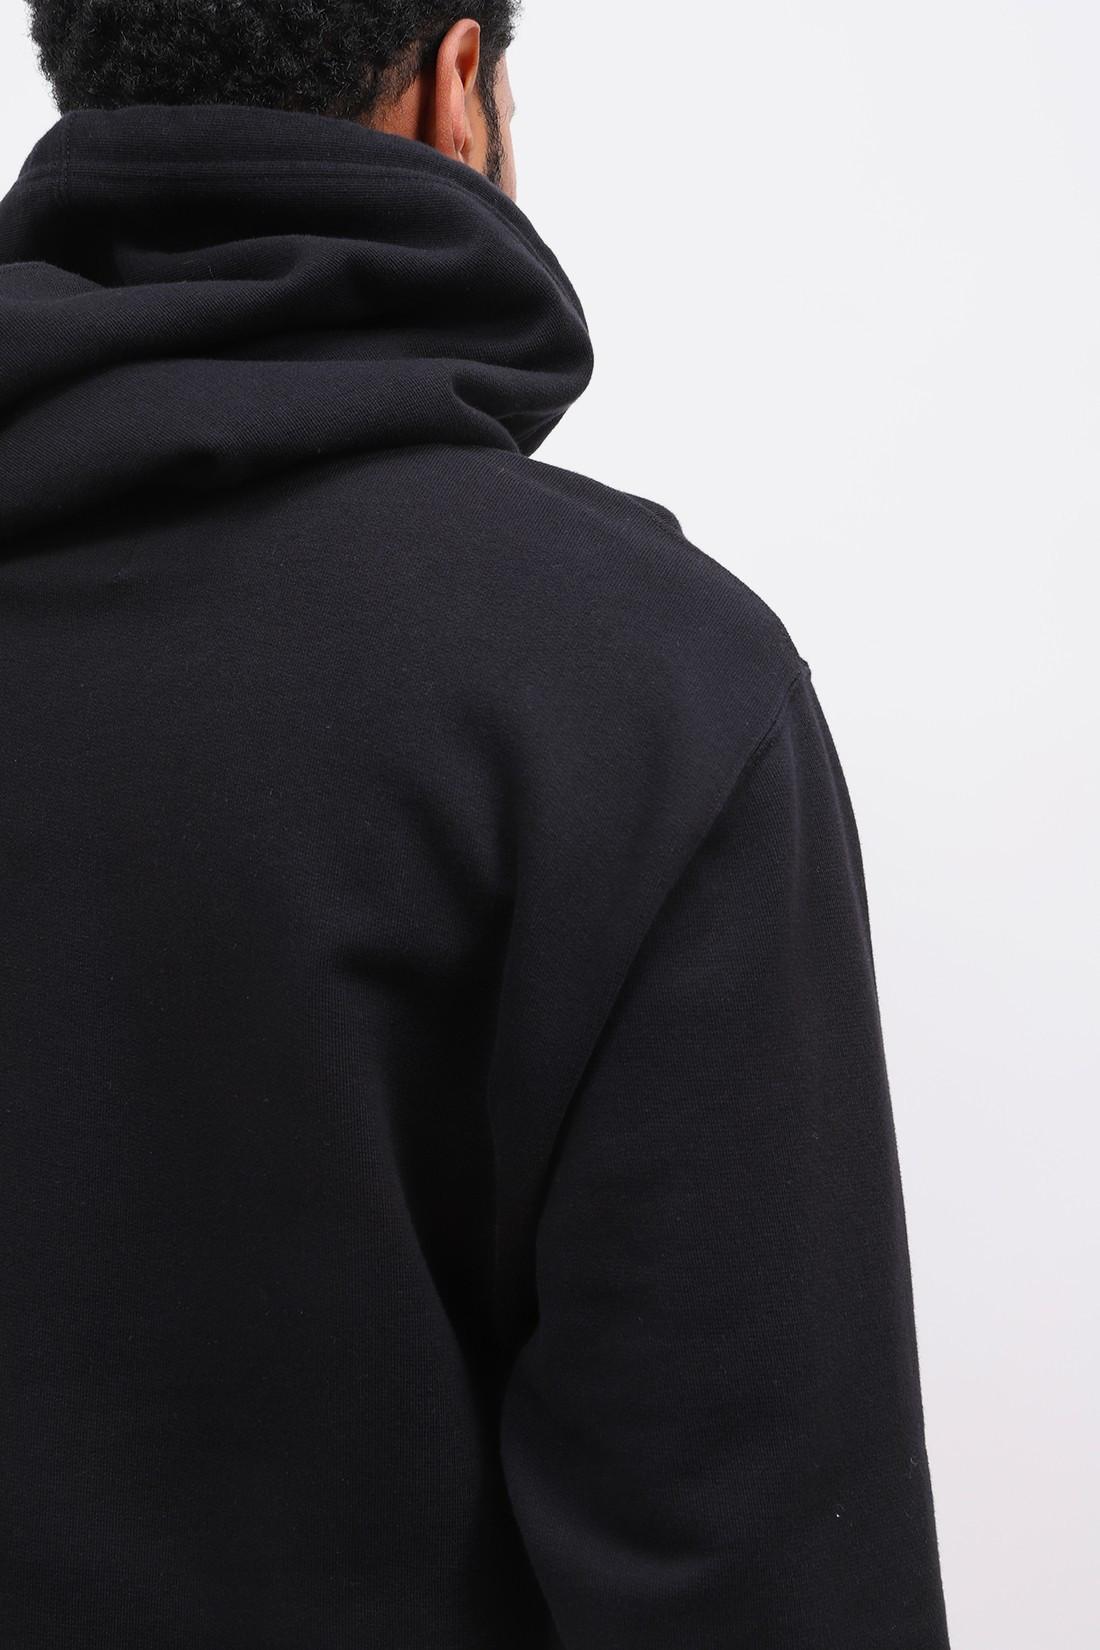 EDWIN / Sunset on mt fuji hoodie sweat Black